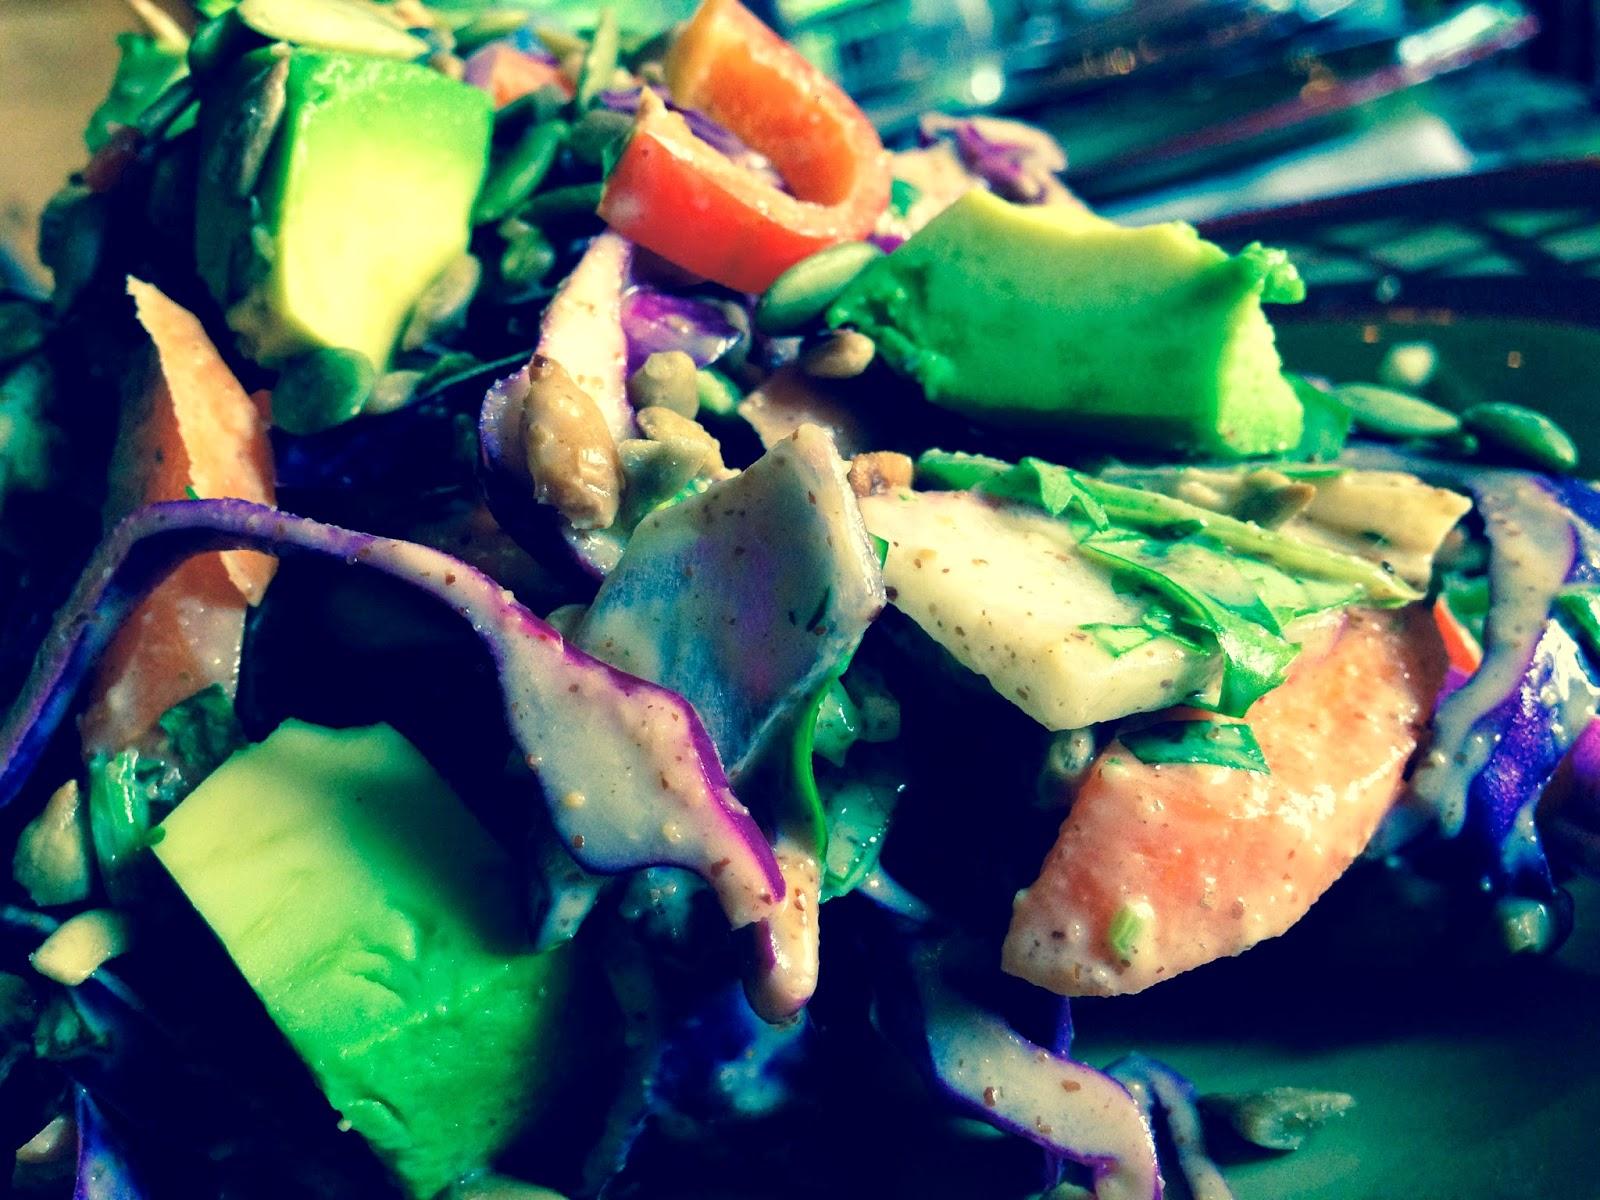 Kitchen Sink Salad by BeautyBeyondBones #glutenfree #grainfree #vegan #paleo #vegetarian #food #dinner #edrecovery